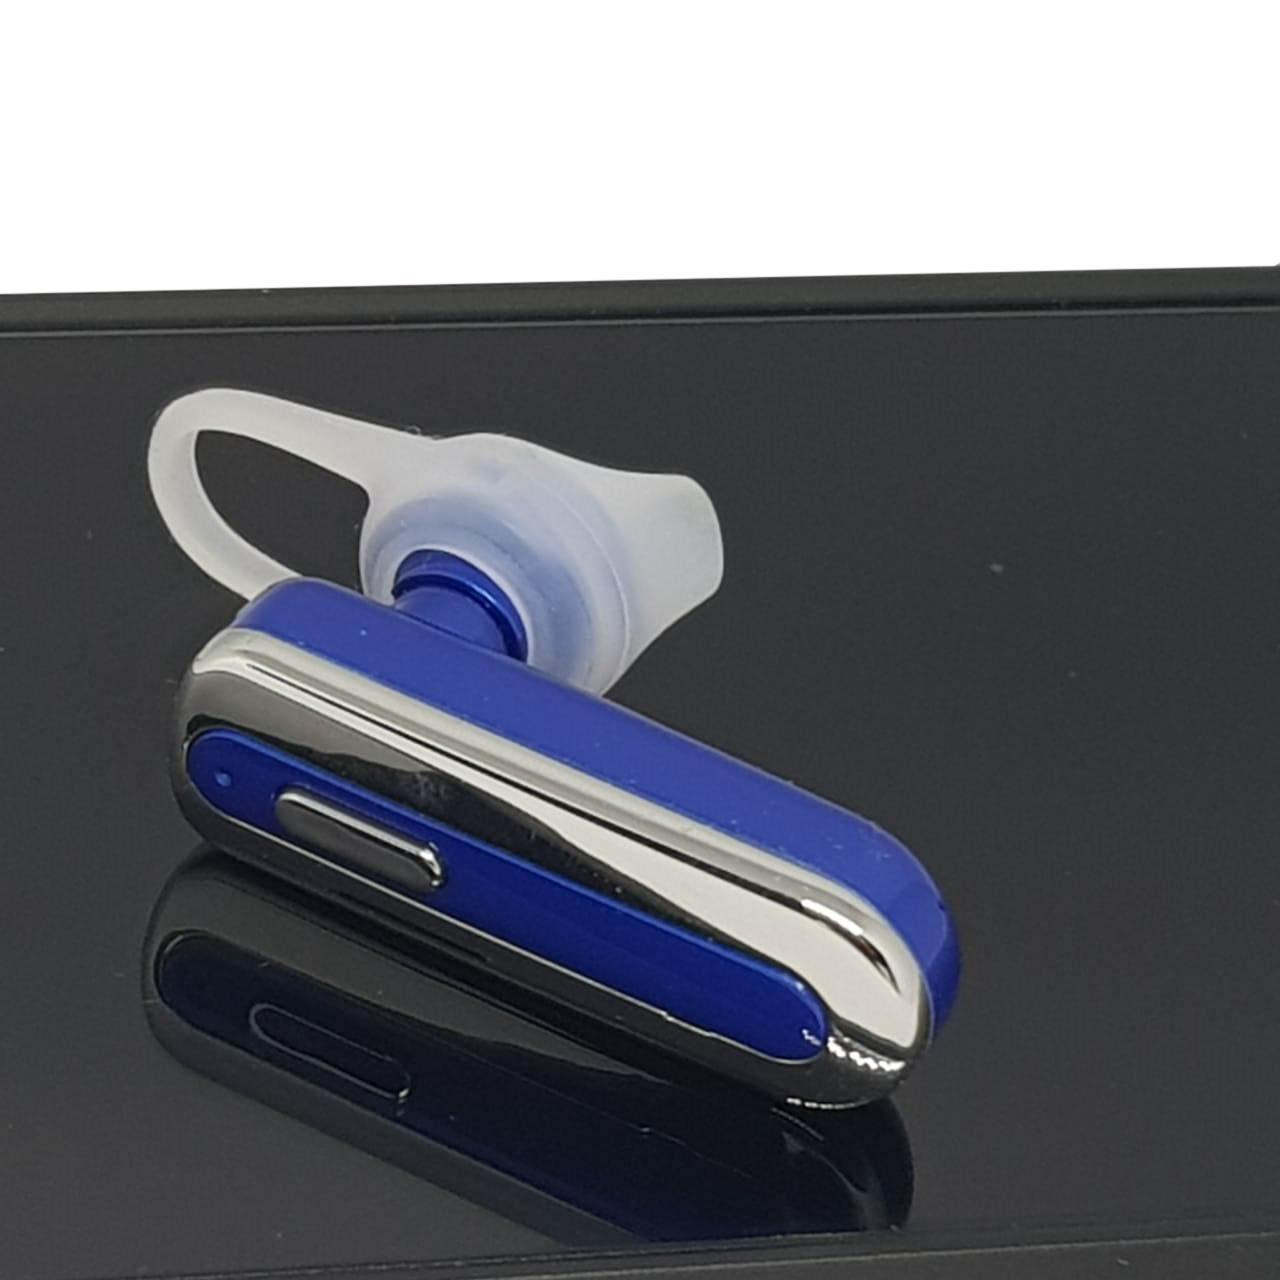 TWS Original Bluetooth  Mini M11 Headset Earphone with Mic for all Mobiles Phone